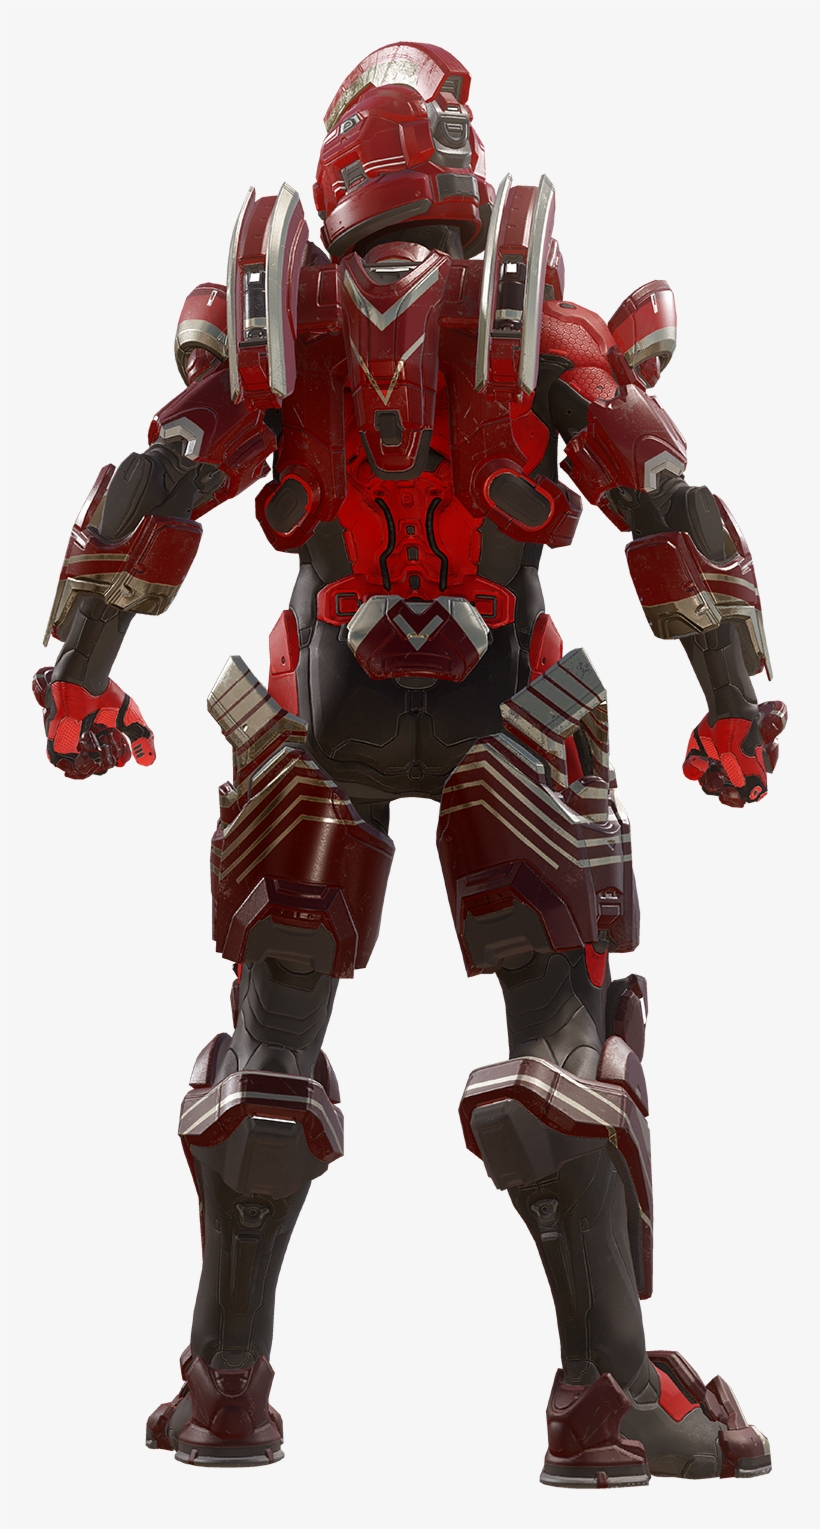 Halo 4 Armor Skins Download - Free Transparent PNG Download